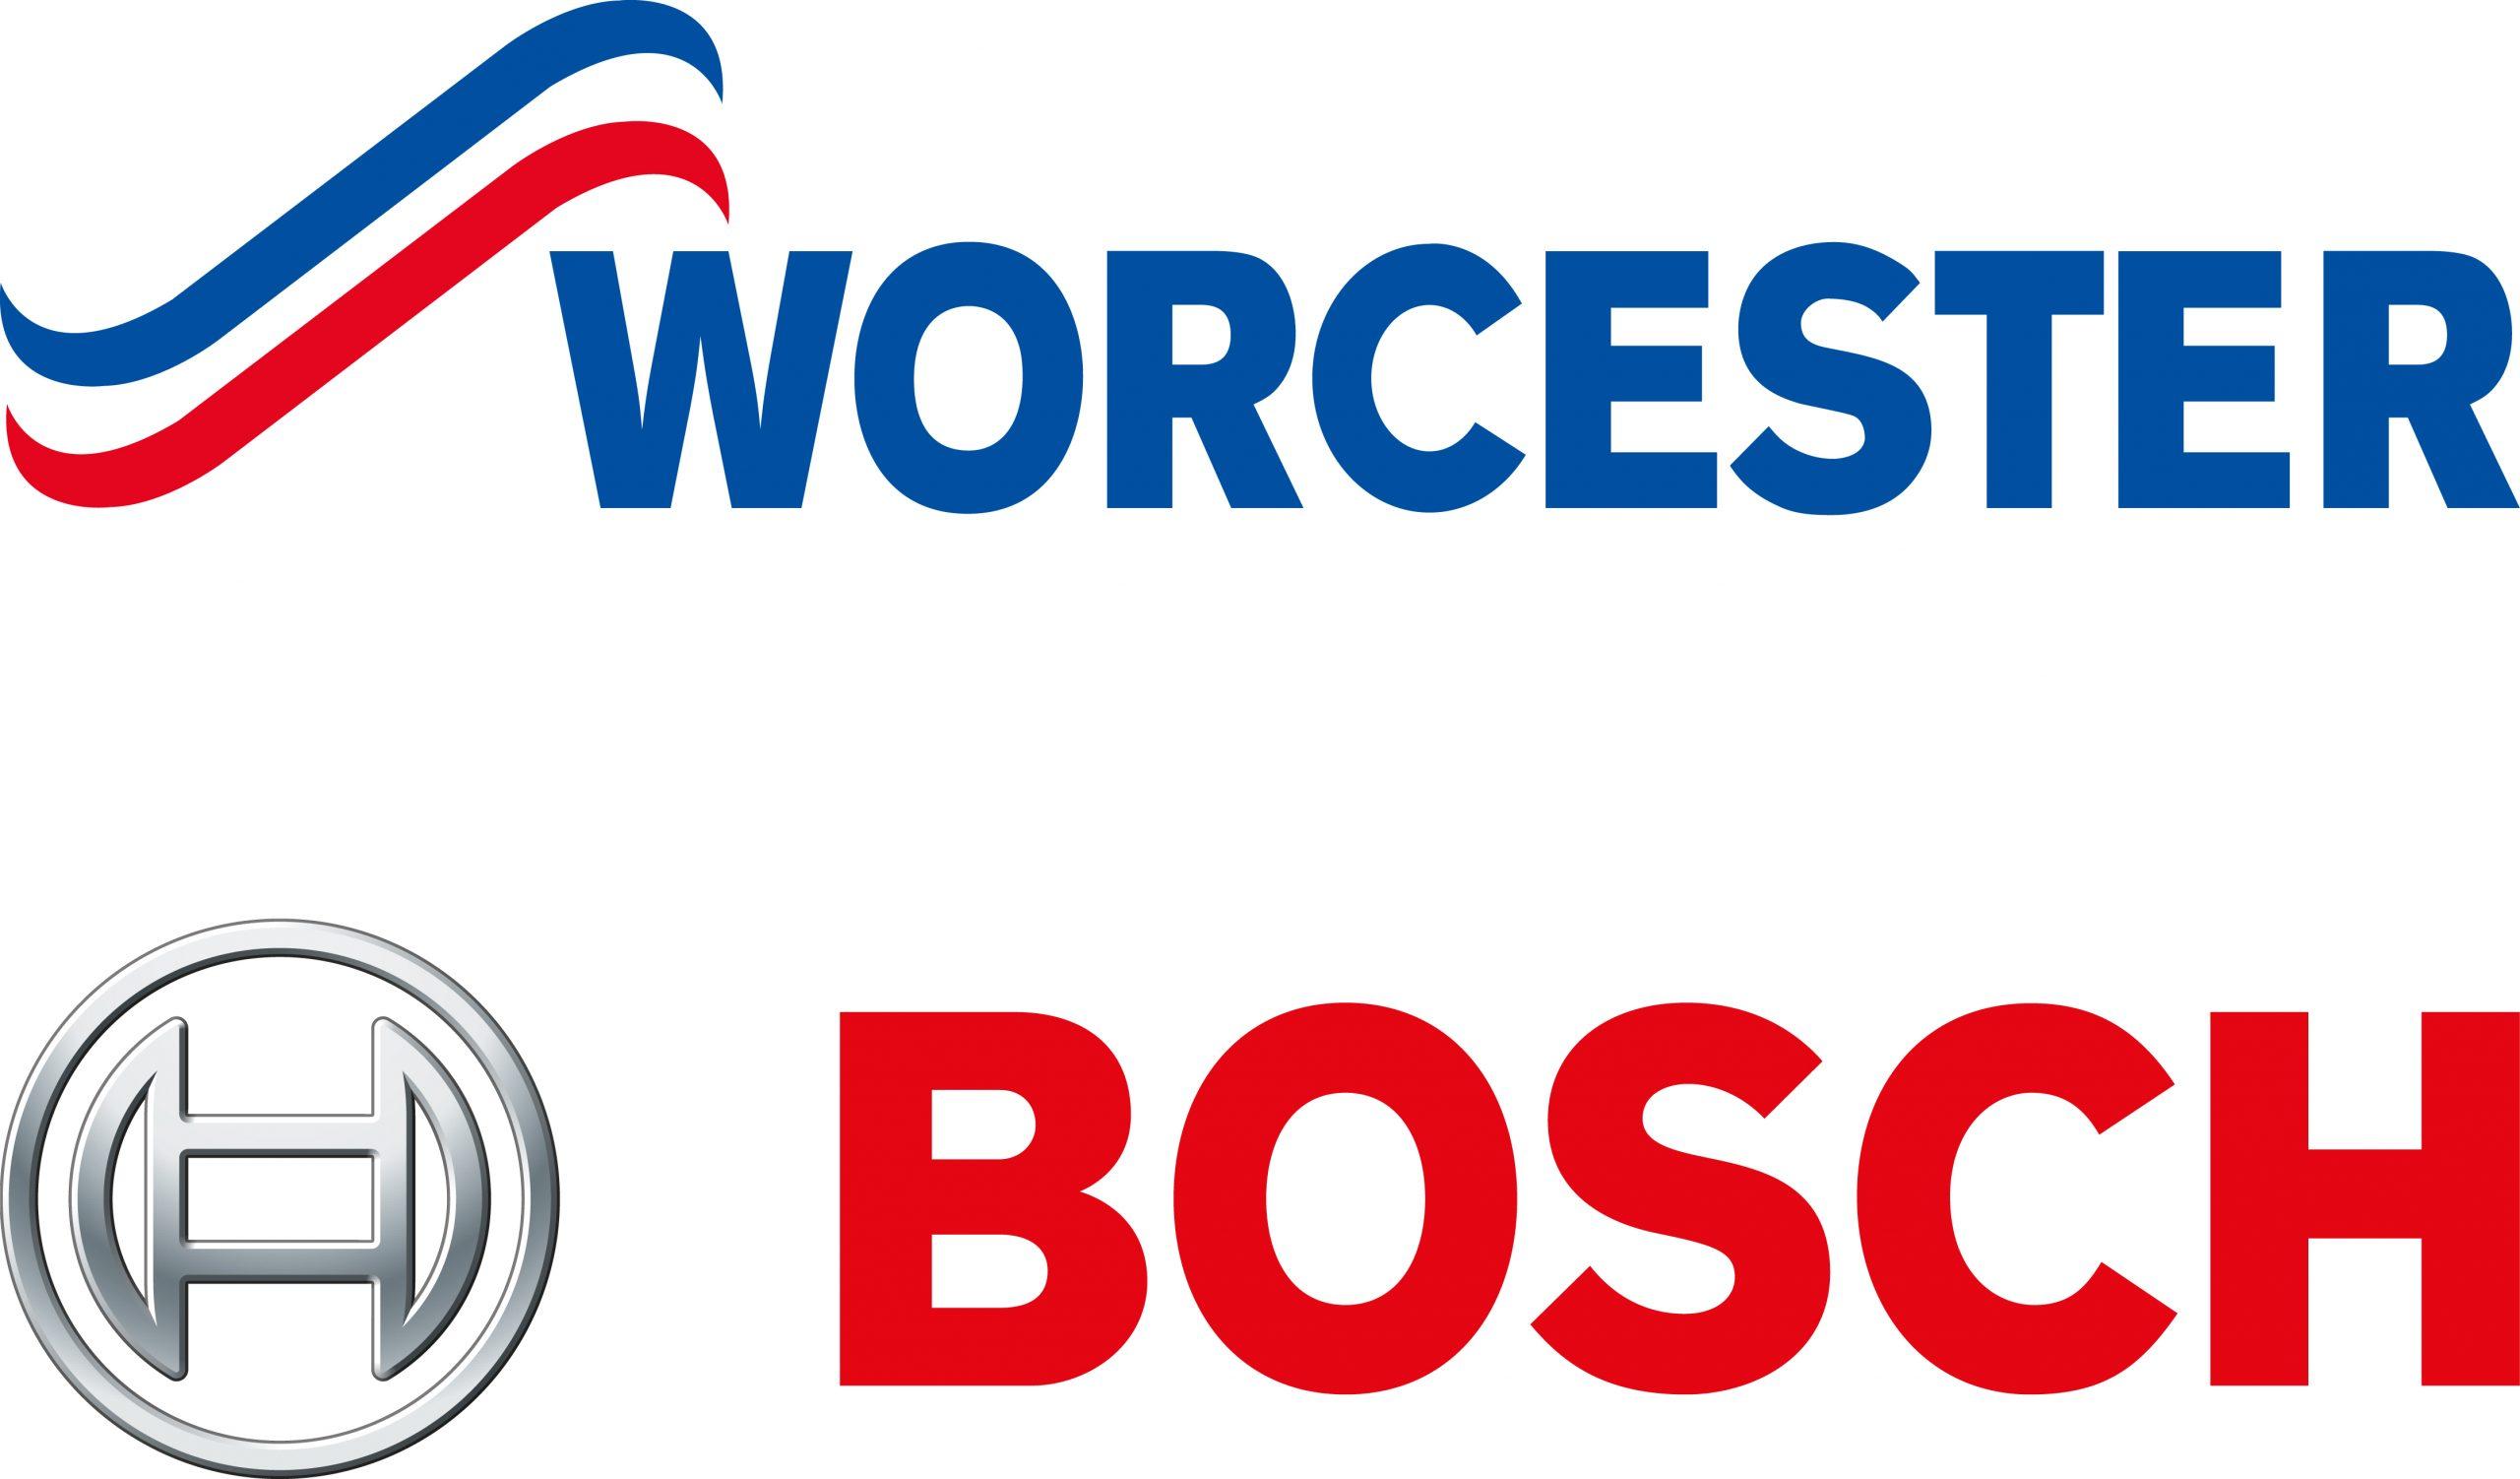 Worcs&Bosch Stacked NO SUPERGRAPHIC